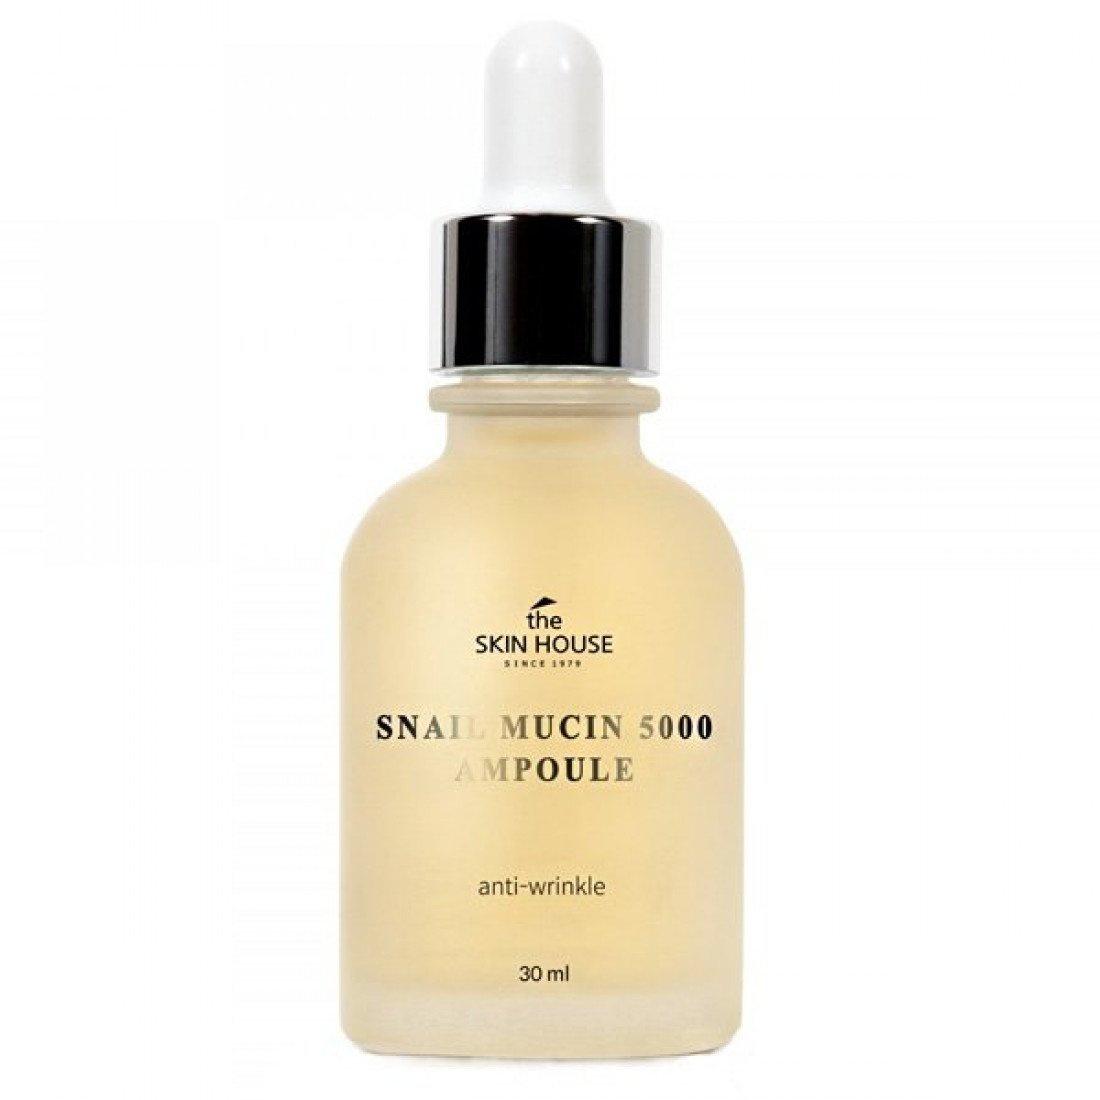 The Skin House Snail Mucin 5000 Ampoule